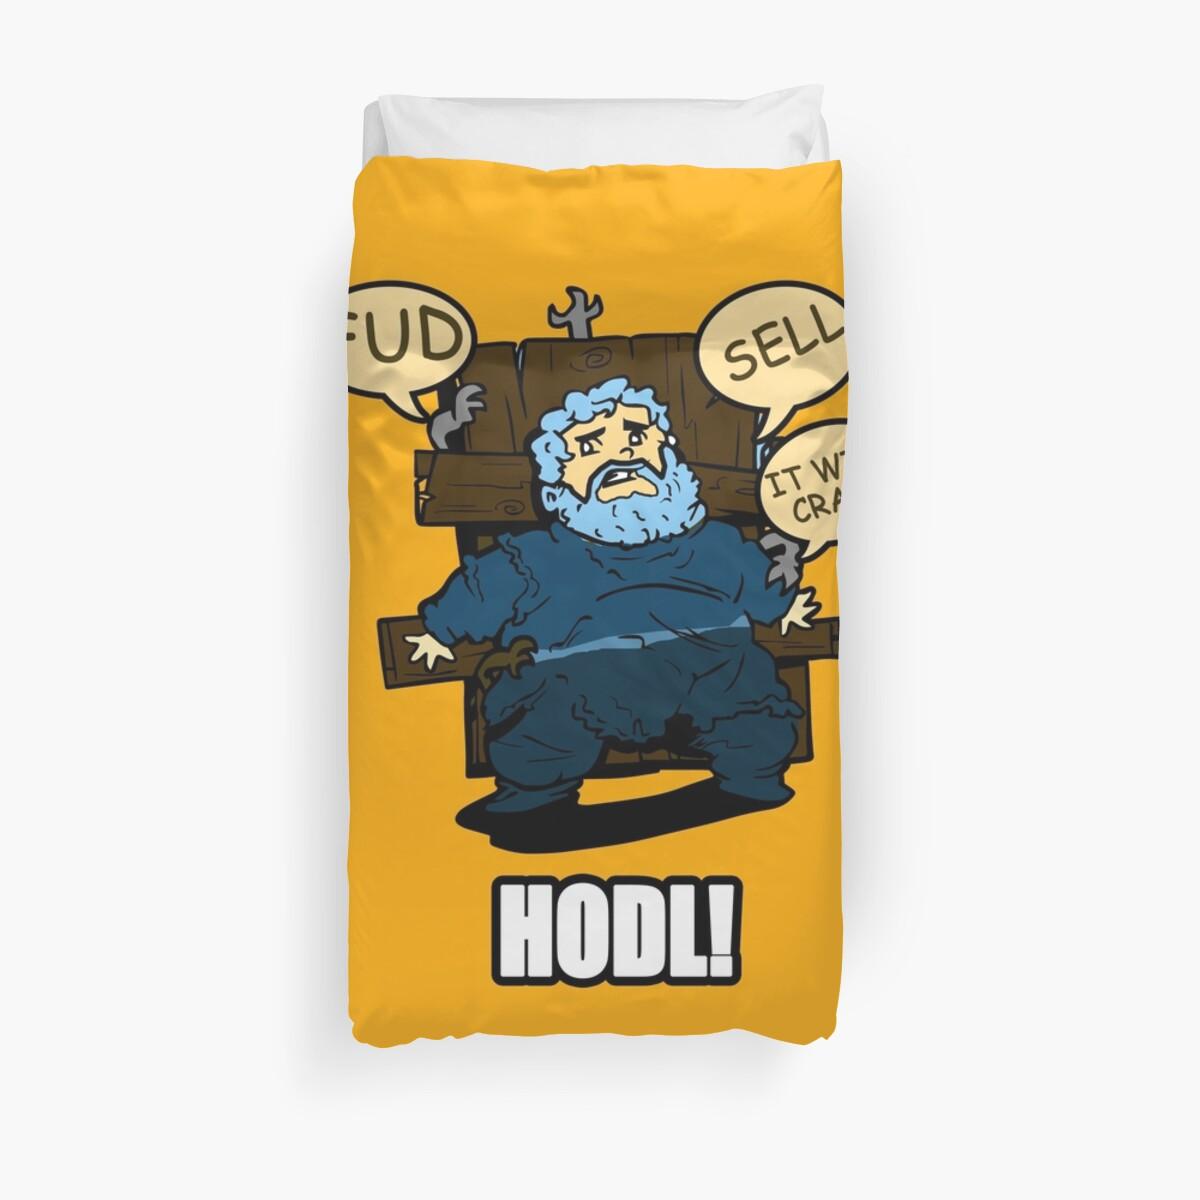 HODL It will crash Funny Bitcoin T shirt Design by hip-hop-art